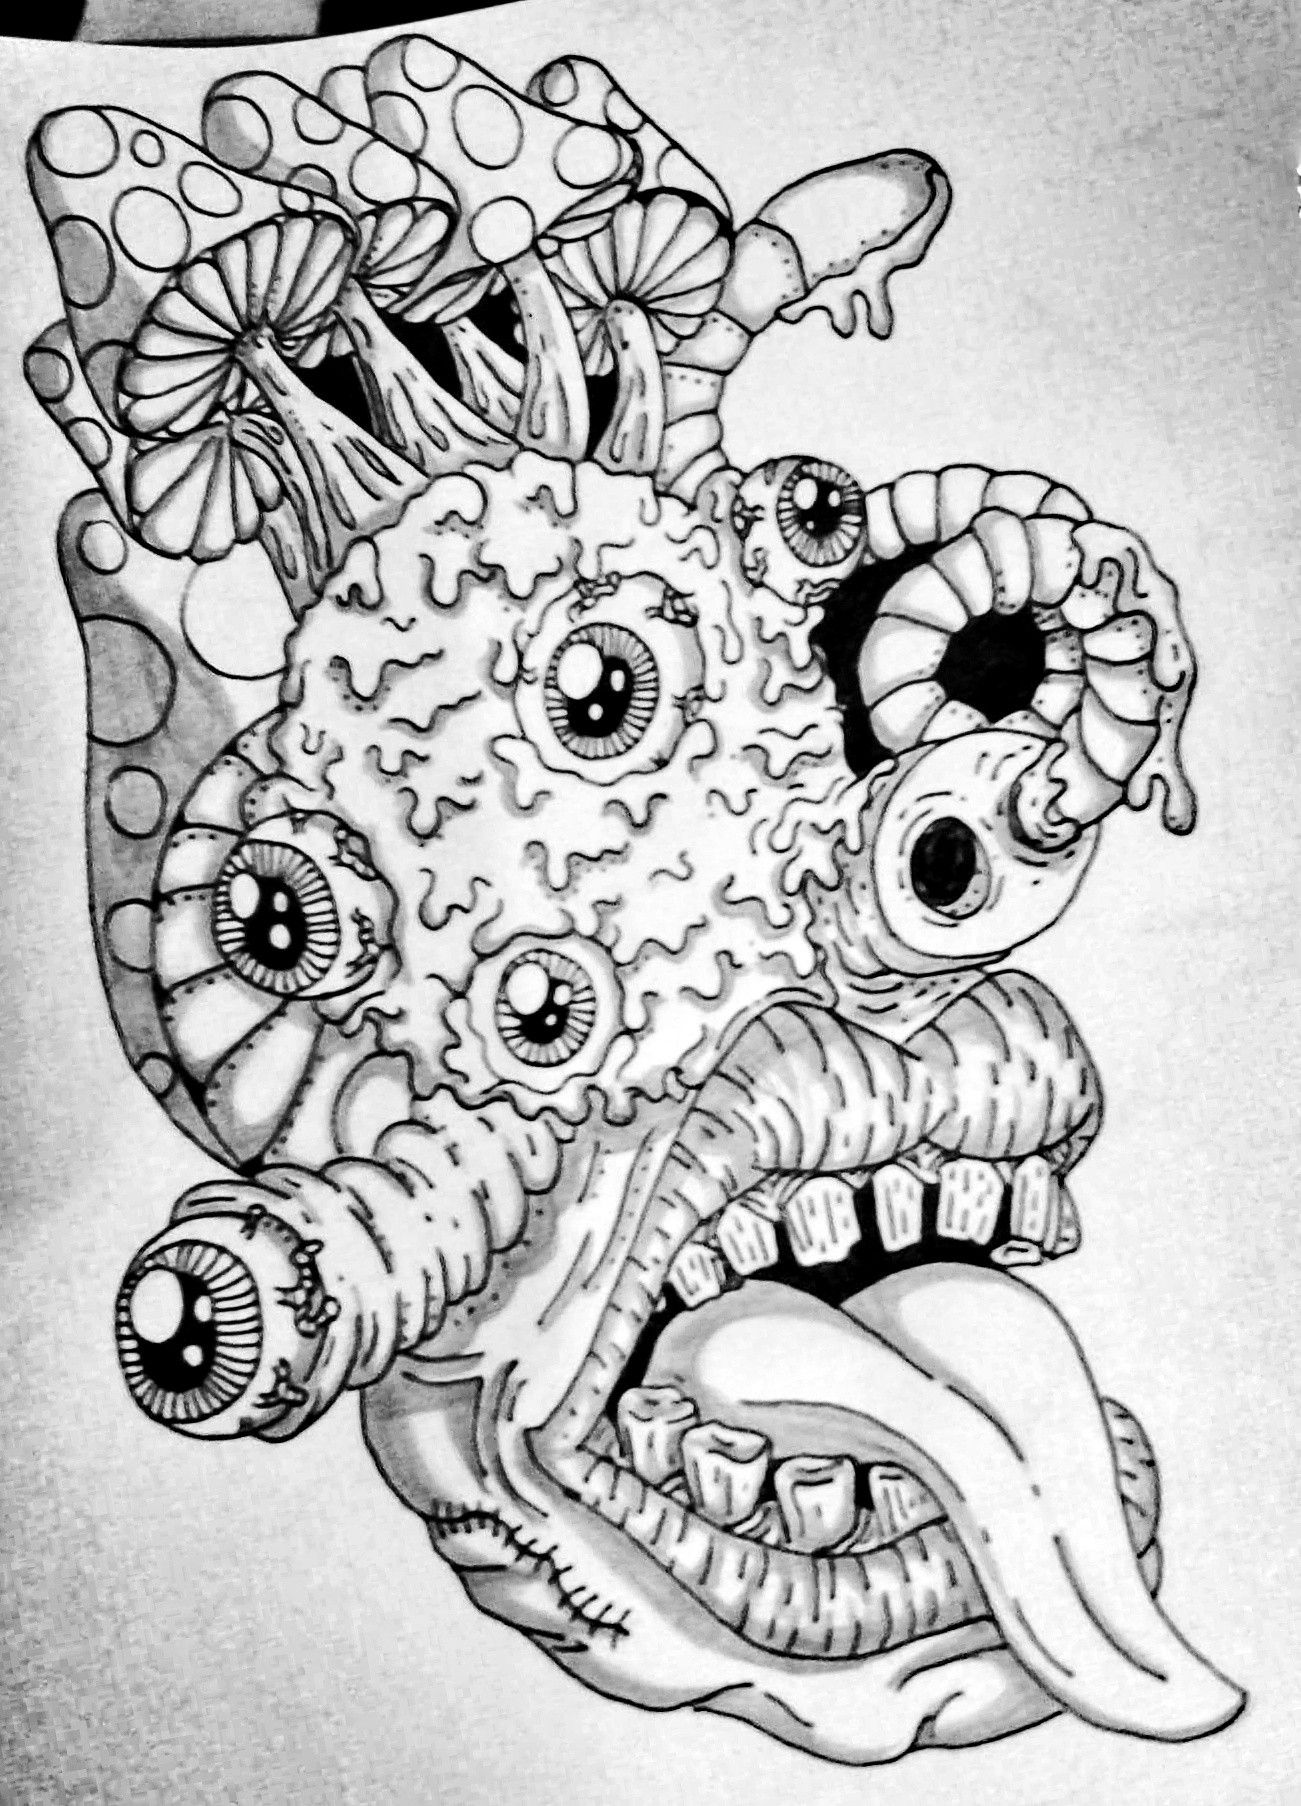 #tattoo #random #doodle #art #psychedelic #mushrooms #eyes ...